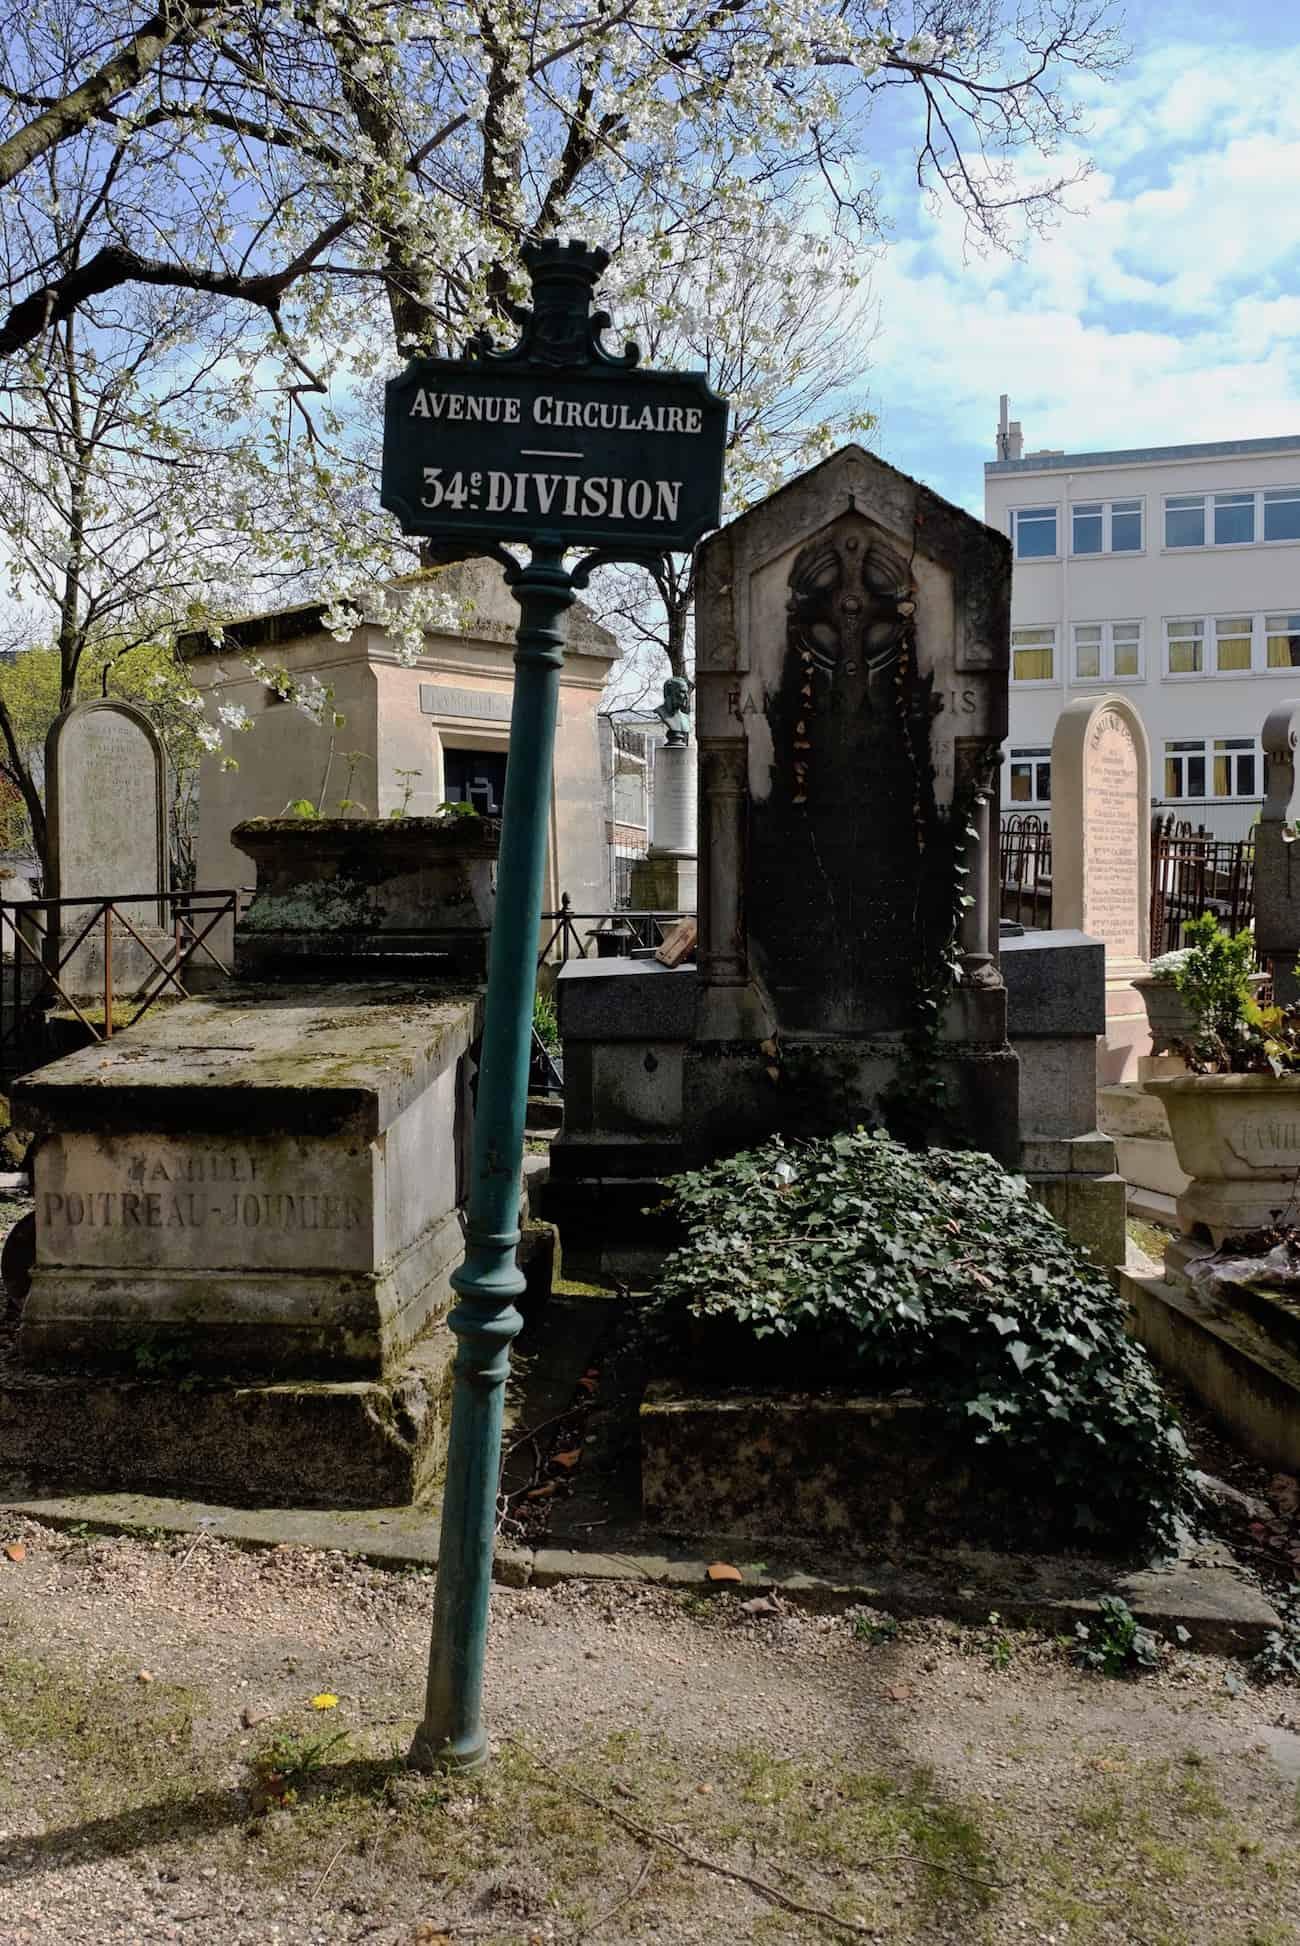 cimetière-pere-lachaise-visite-paris-20e-balade